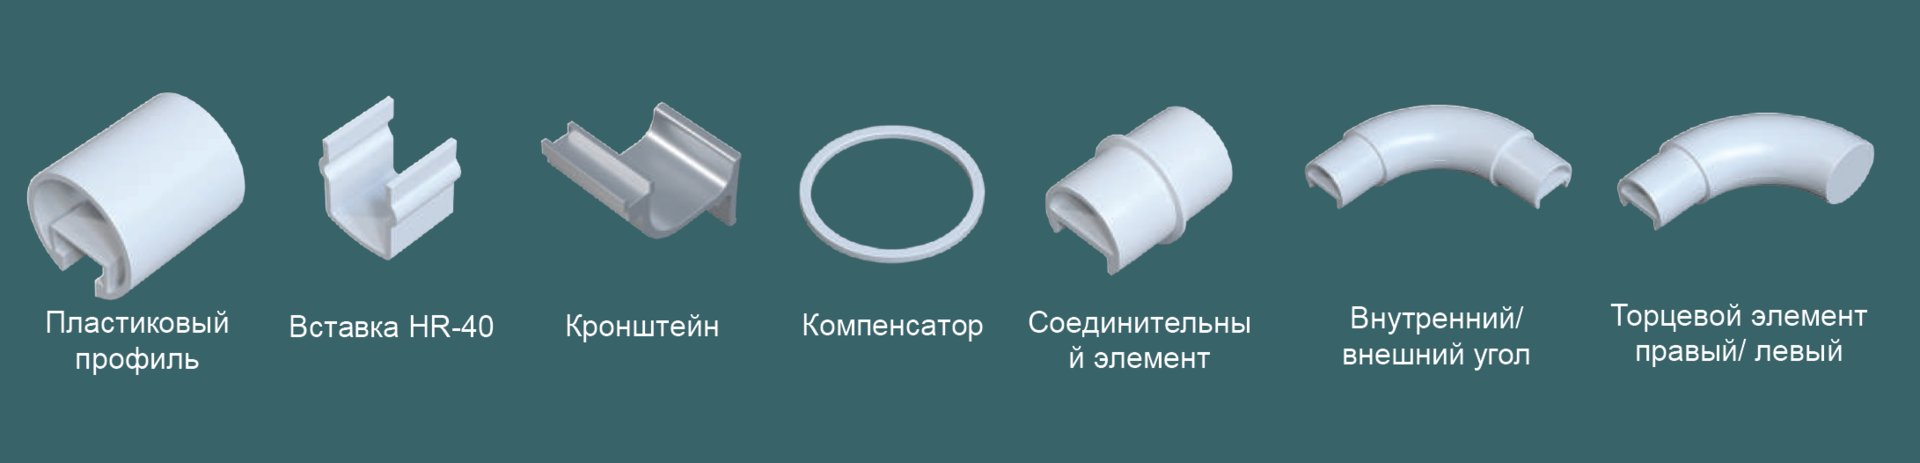 КОМПЛЕКТ ПОСТАВКИ R-40